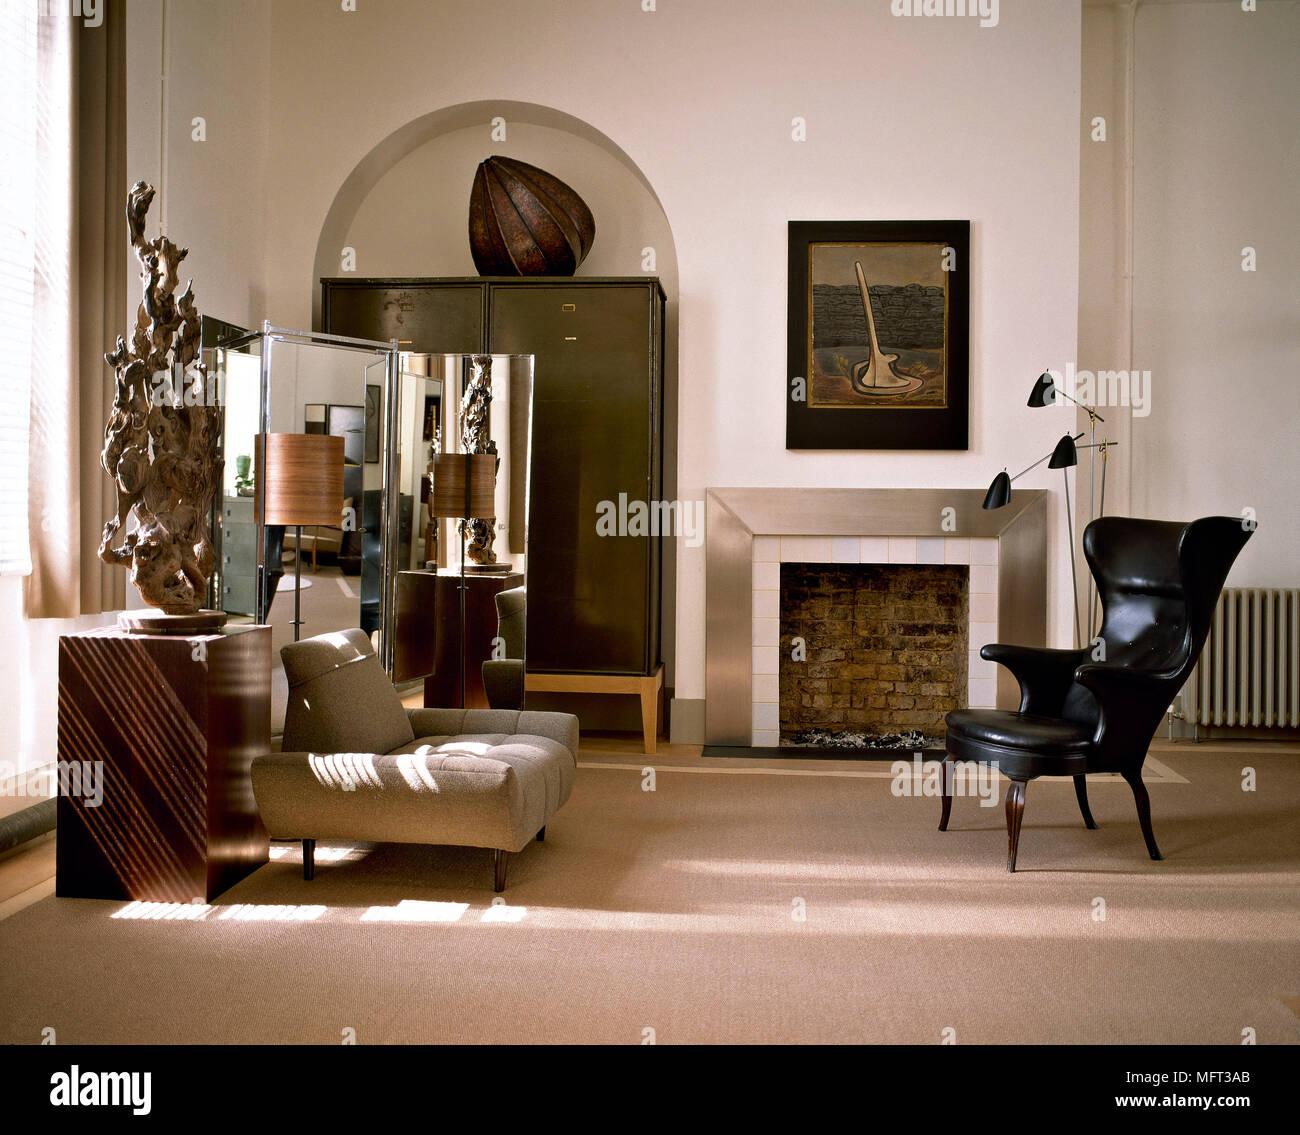 Moderne Neutral Wohnzimmer Schwarz Leder Sessel Kamin Metall